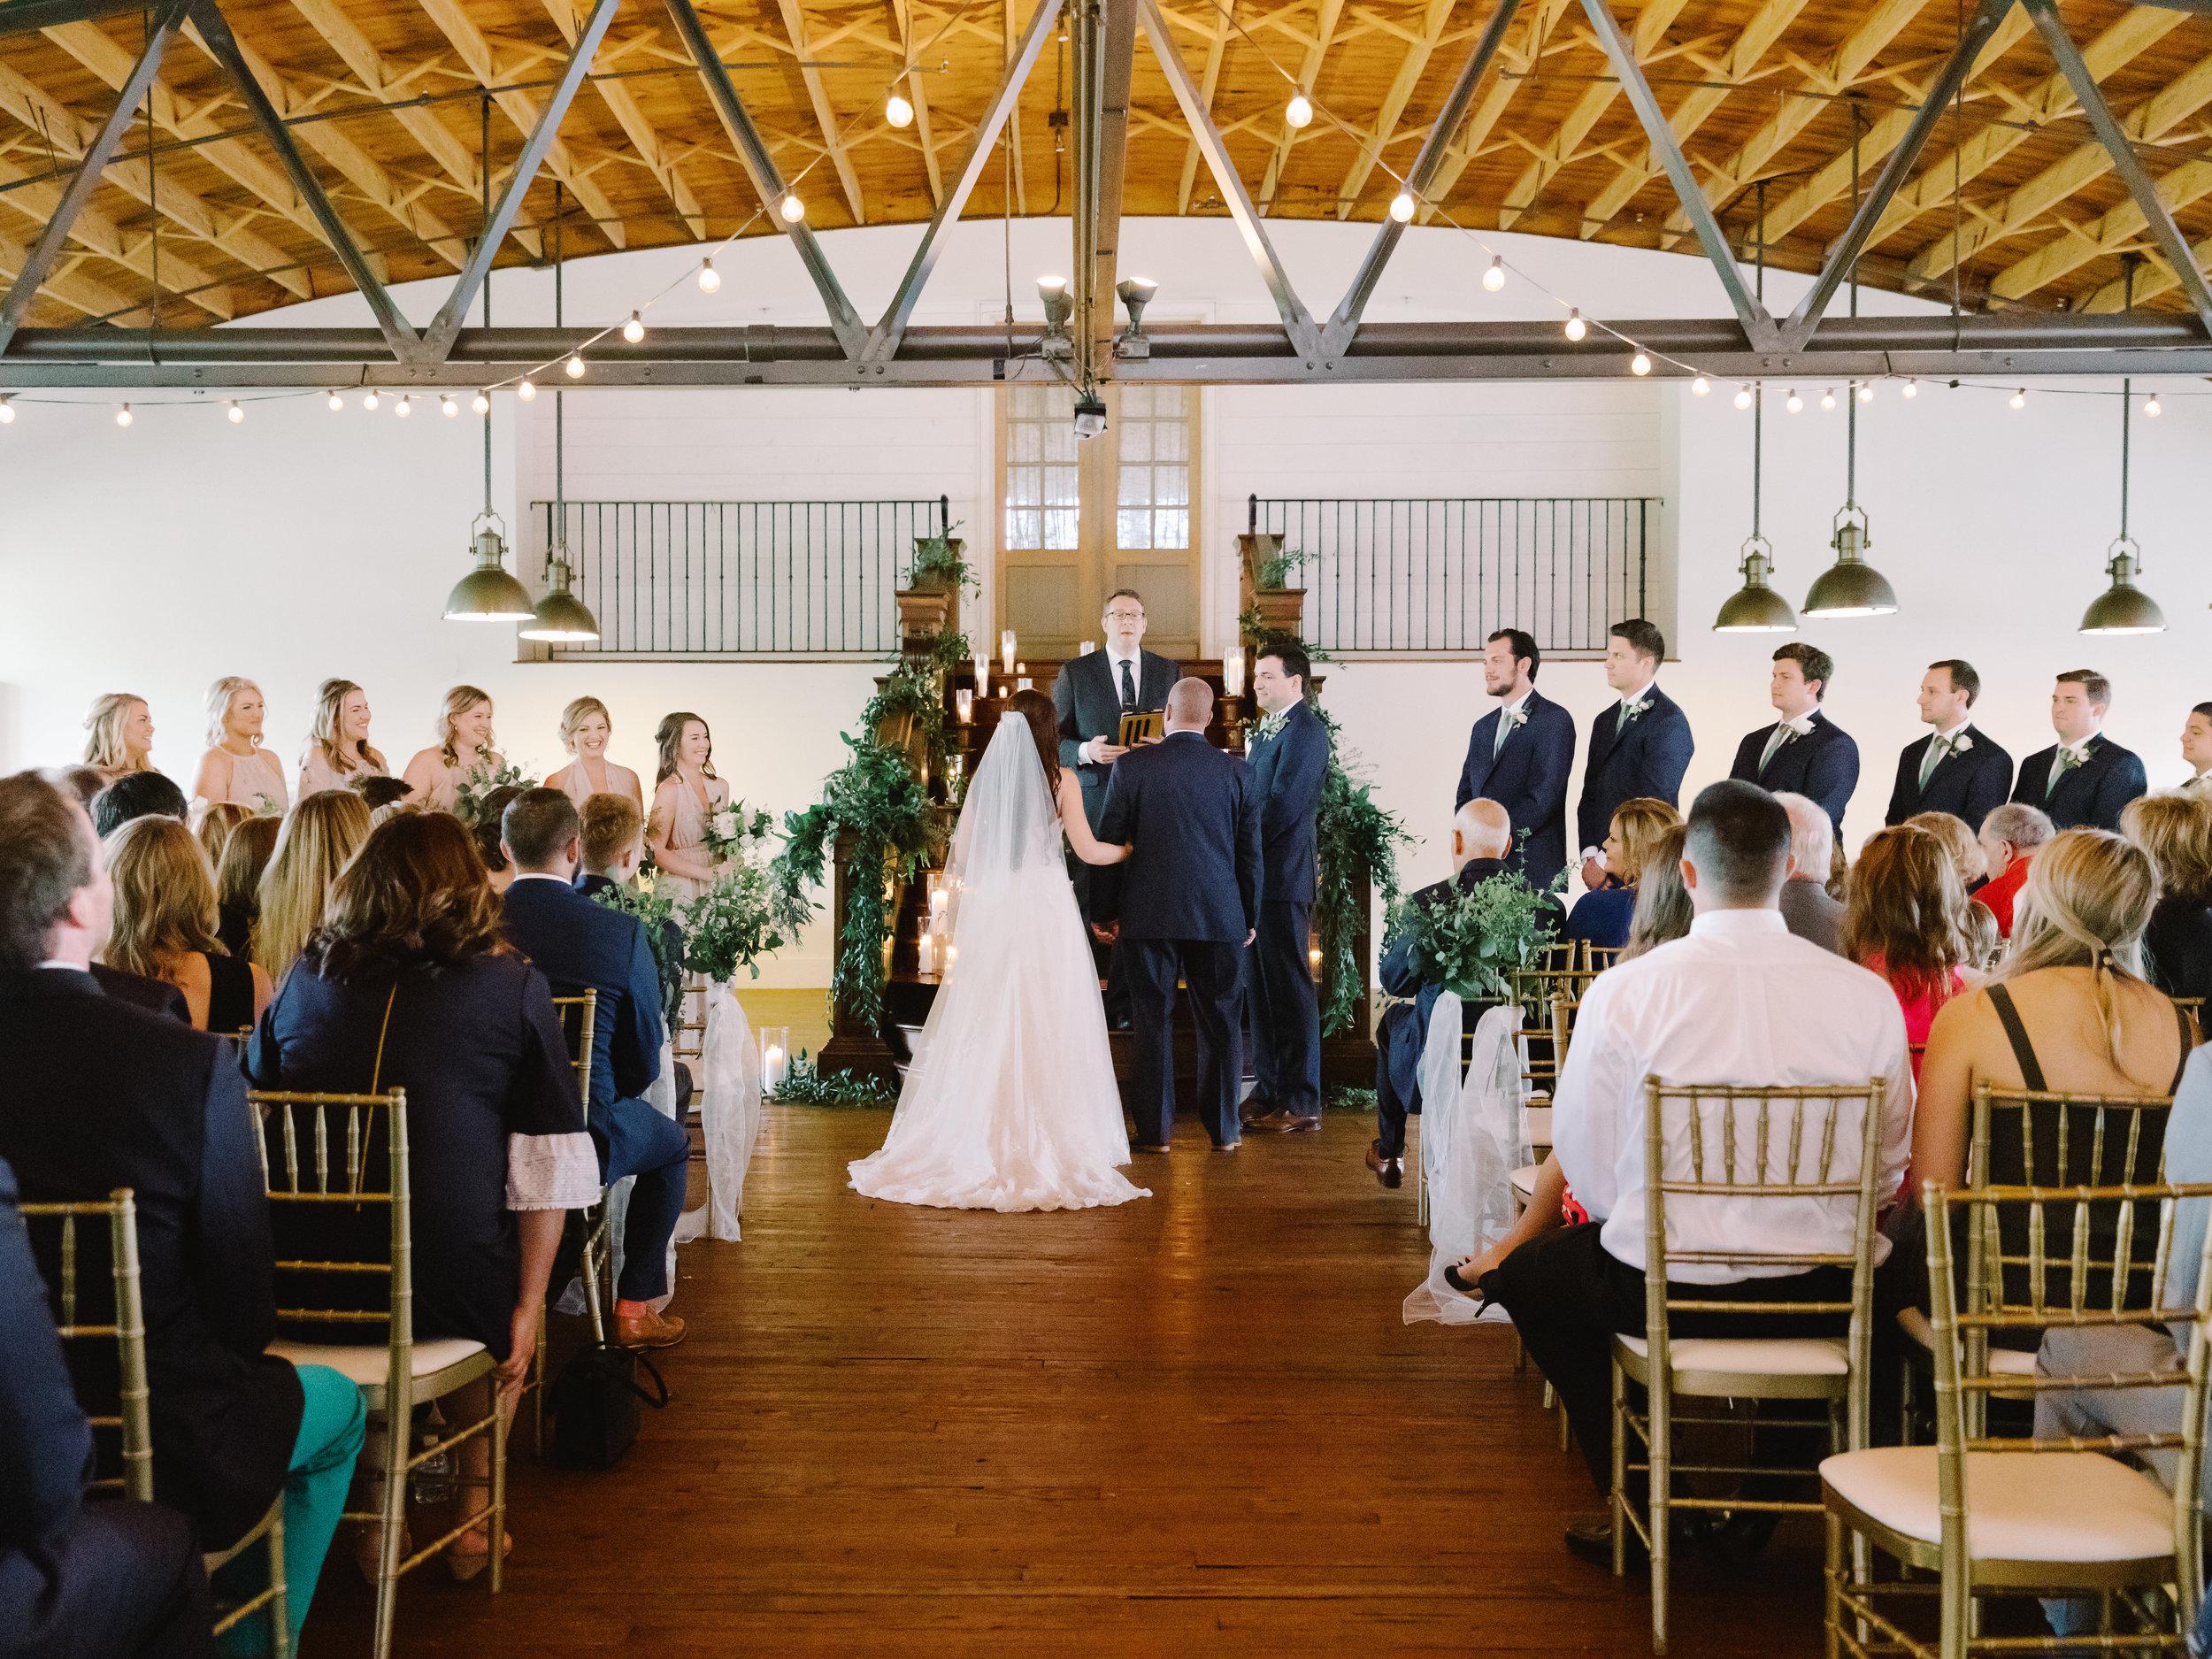 Romantic-Summerour-studio-wedding-hannah-forsberg-atlanta-wedding-photographer47.JPG